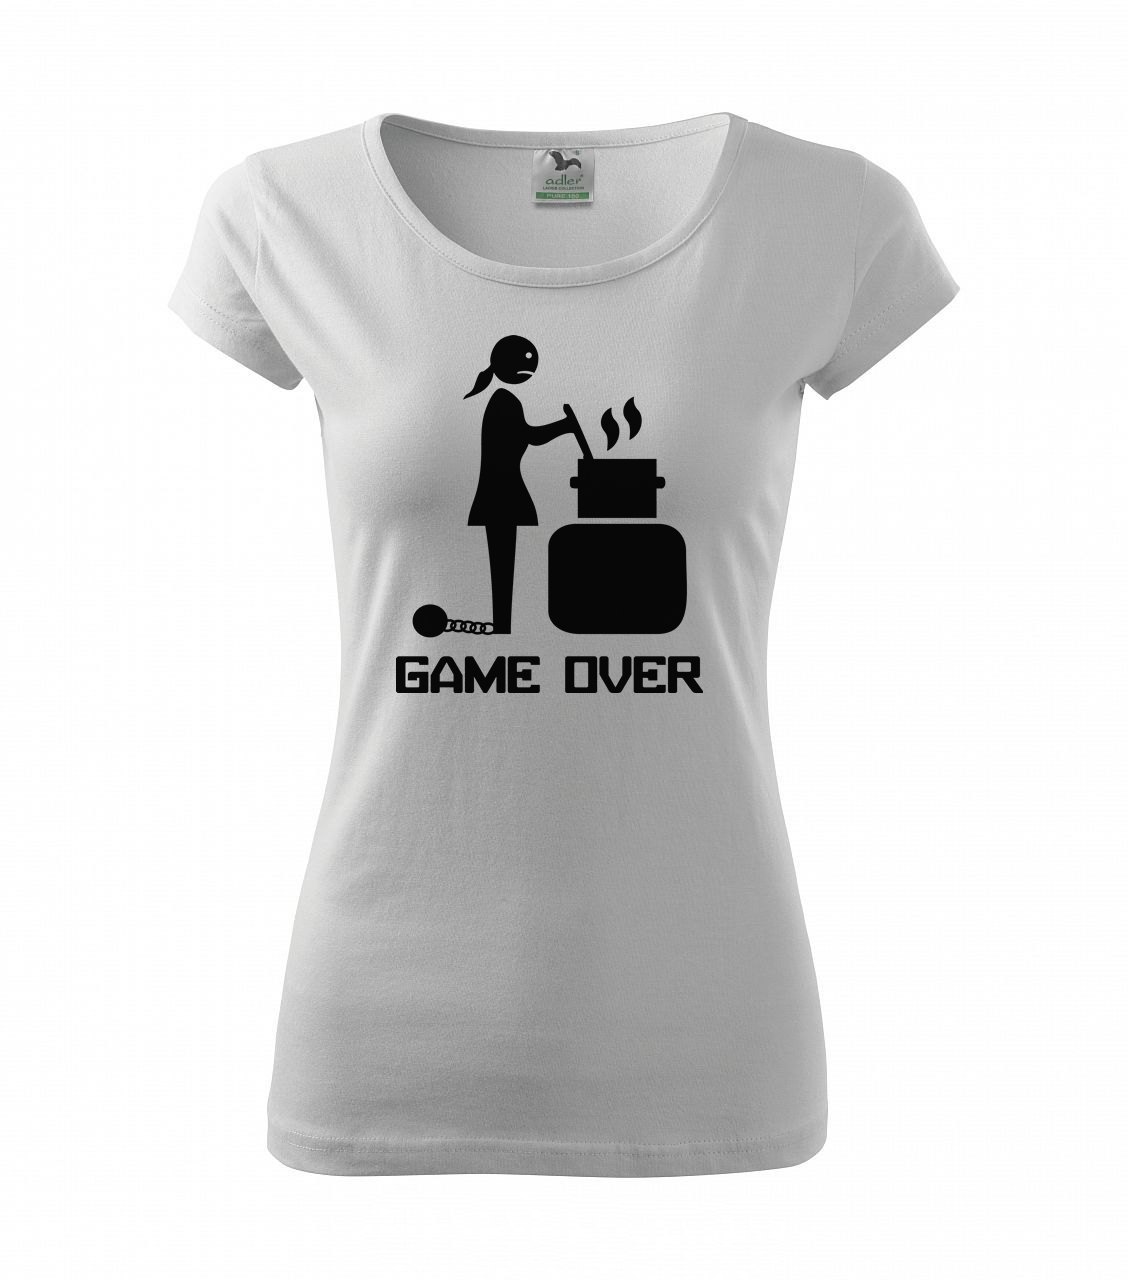 af9d8436b404 Dámské tričko Game over – Na Rozlučku